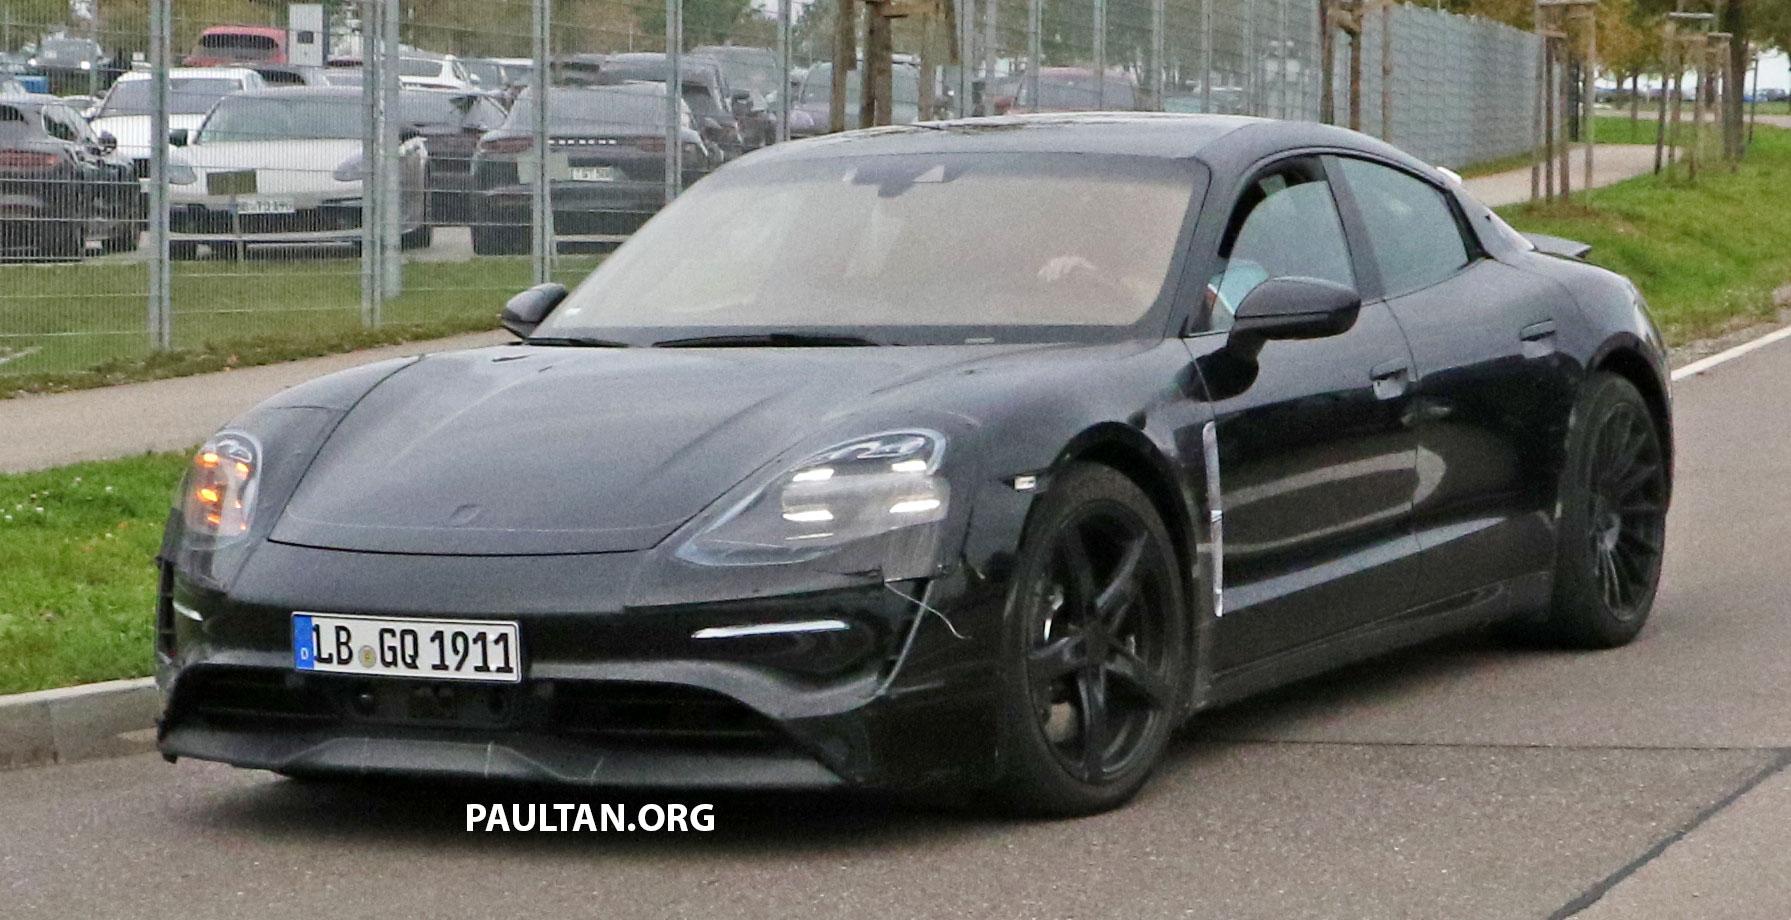 Spyshots Porsche Mission E Spotted Road Testing